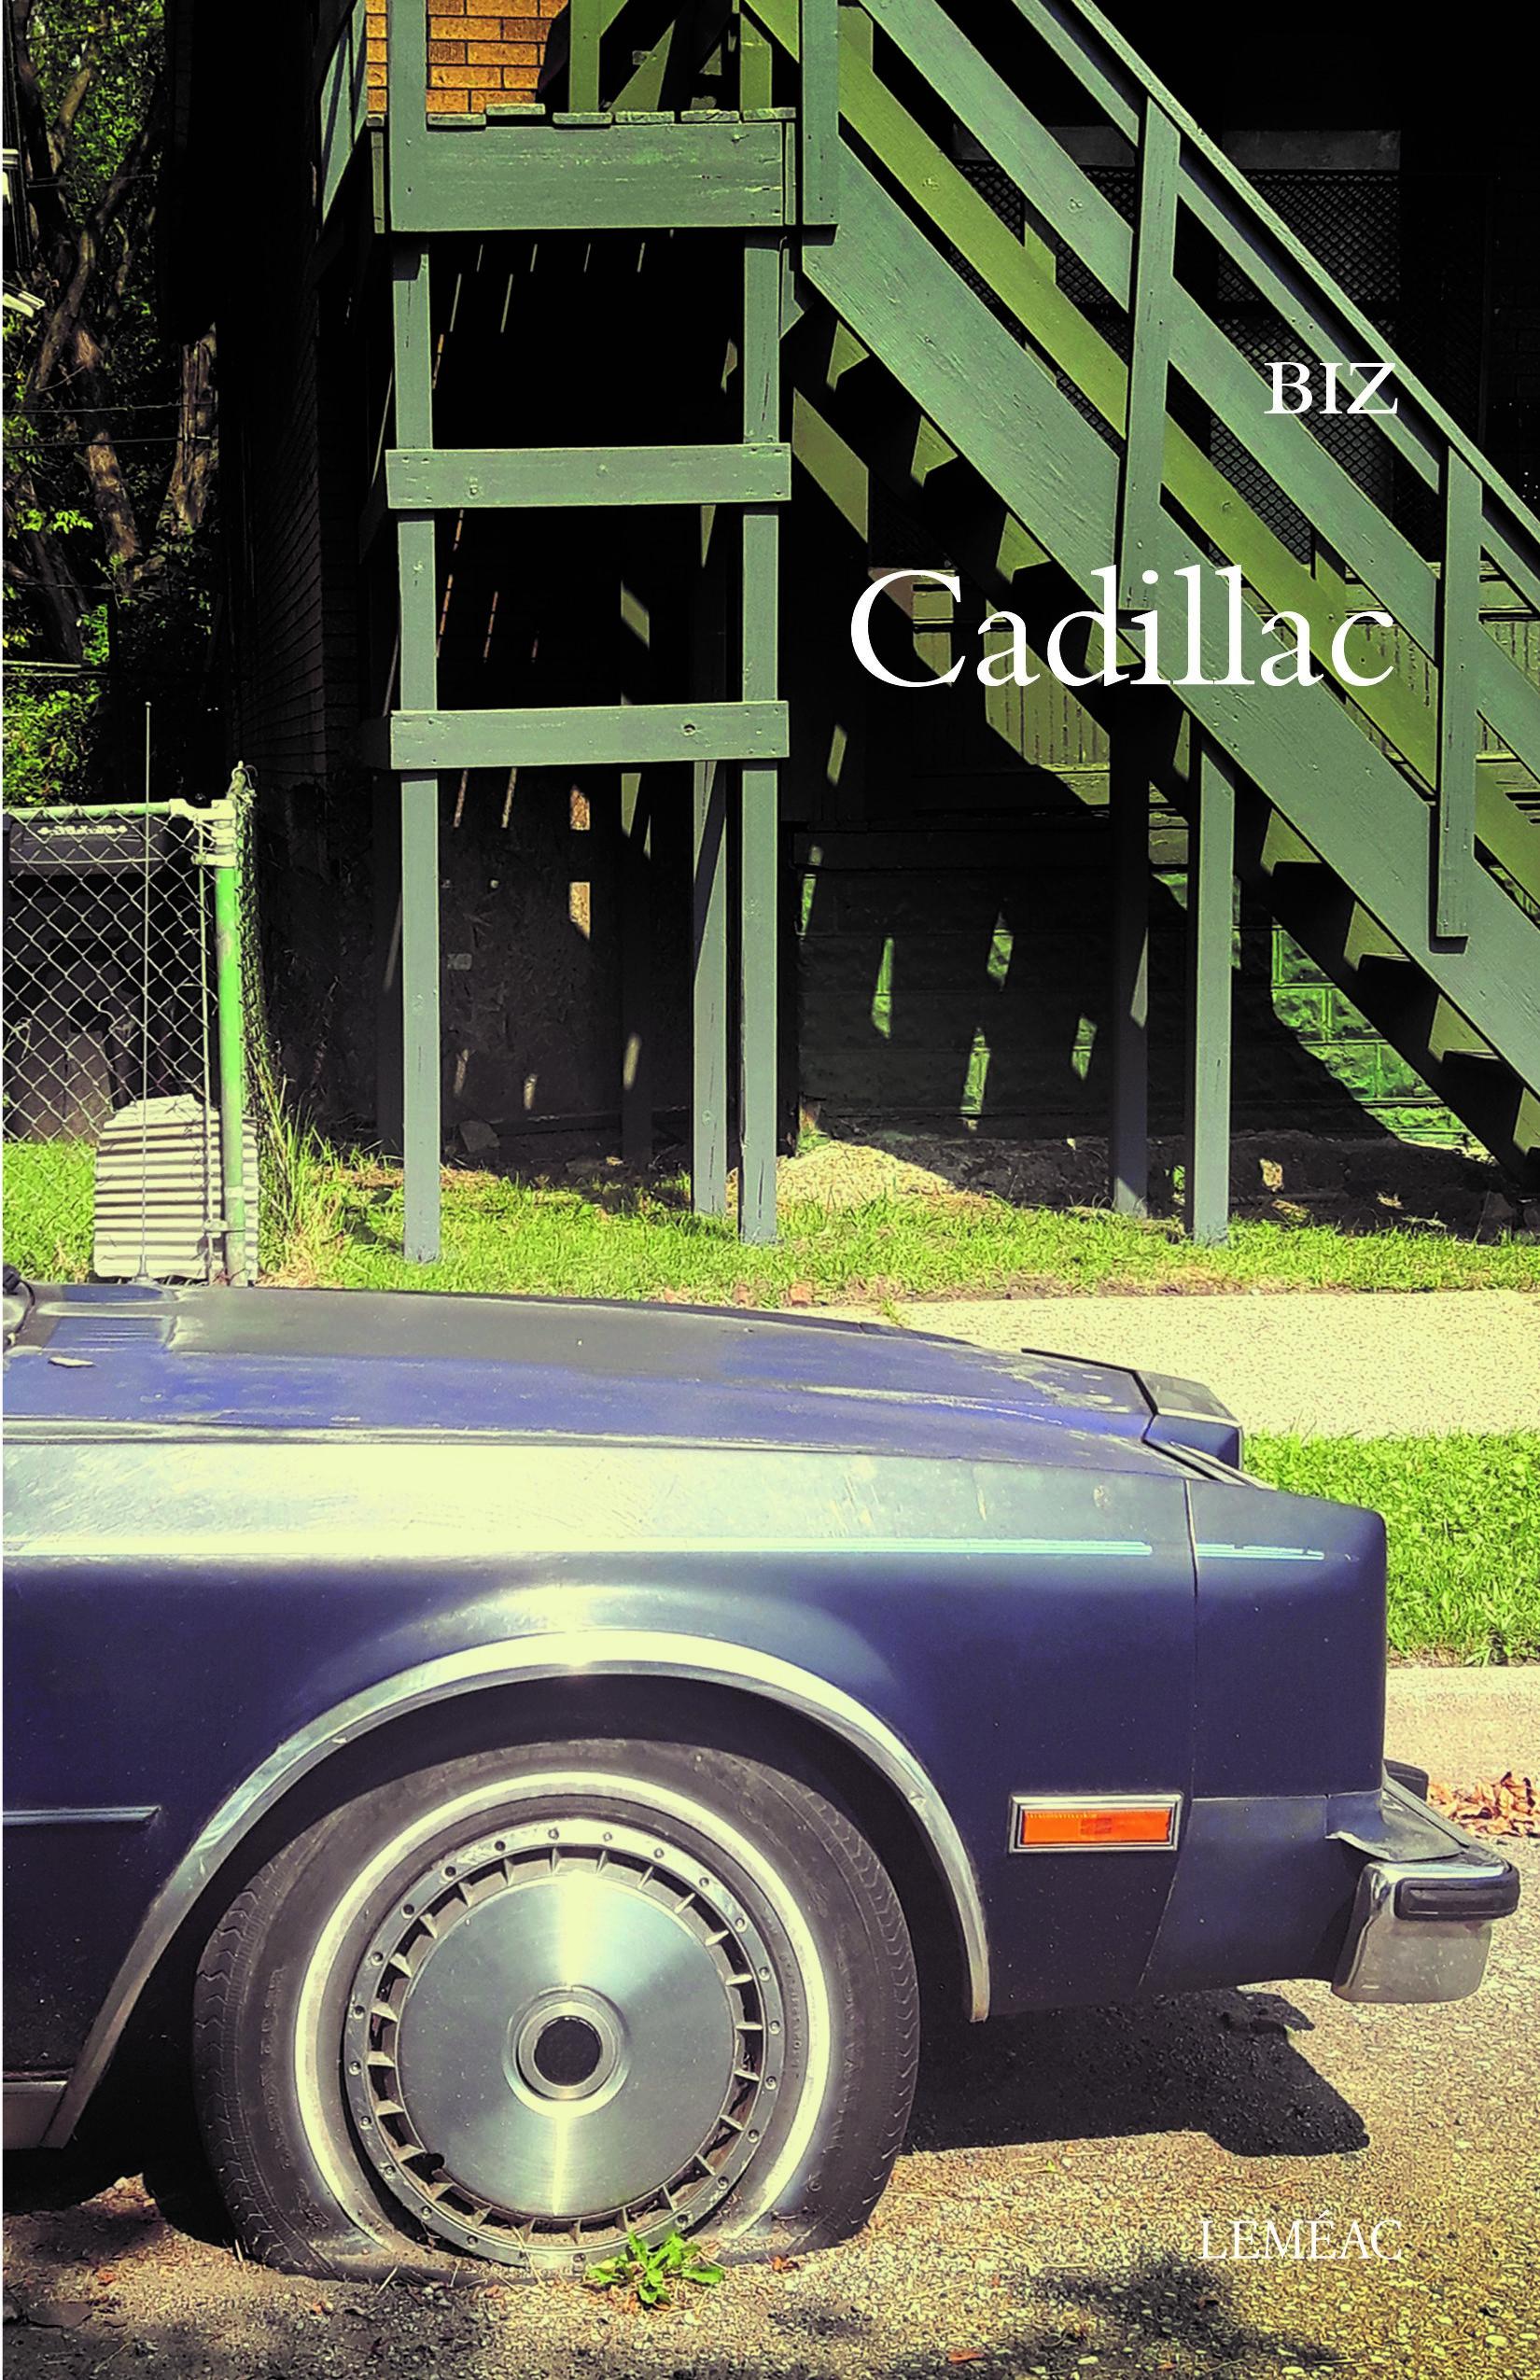 "alt=""Cadillac-biz"""